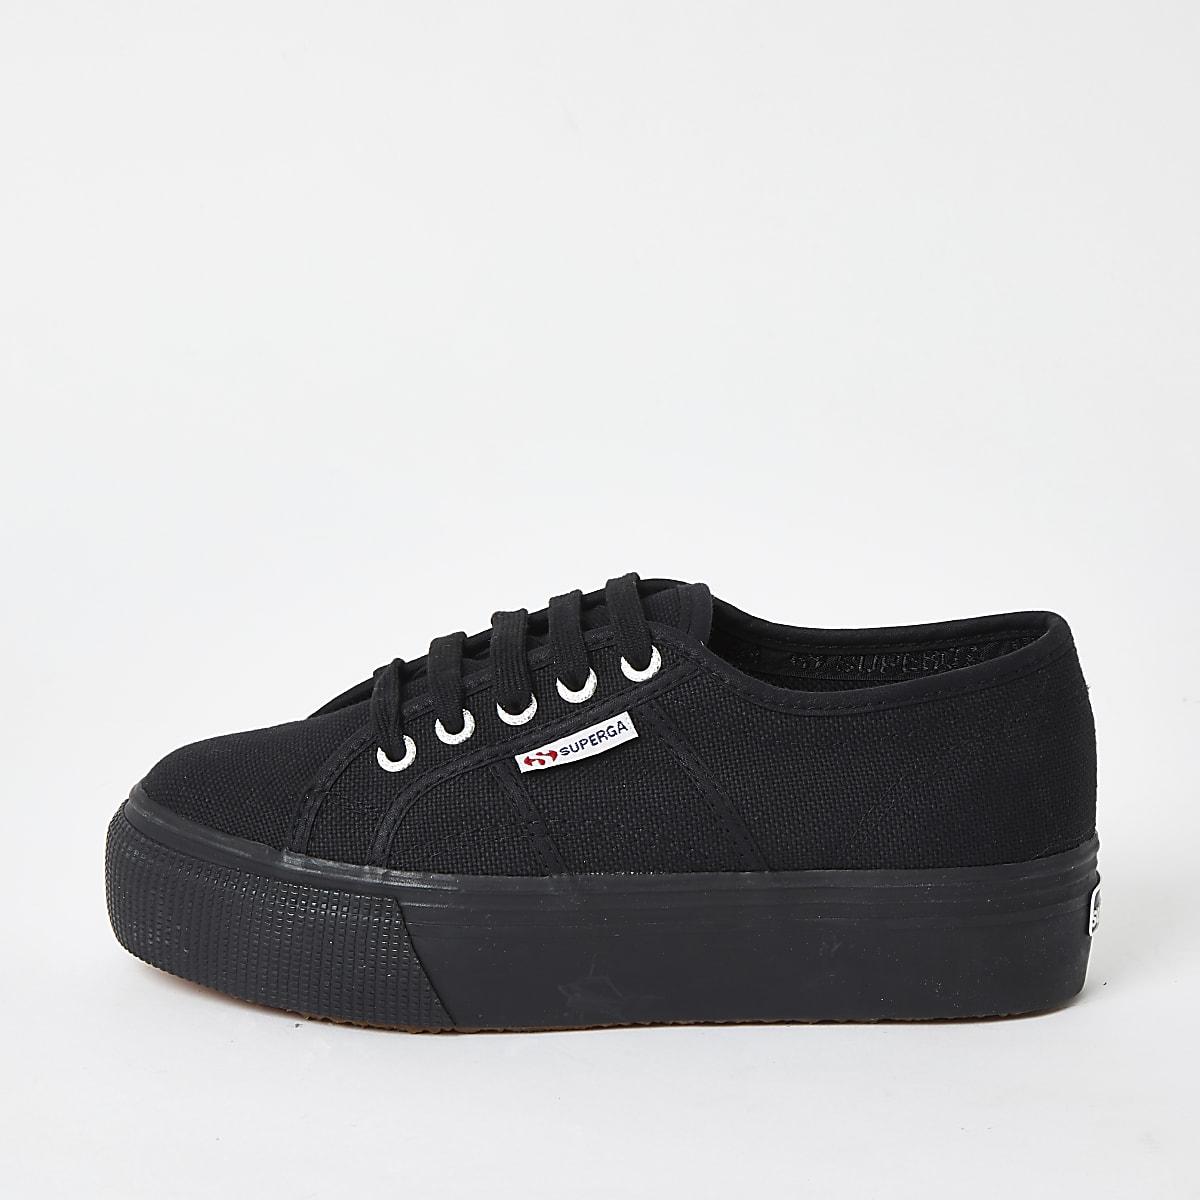 Superga black flatform runner sneakers